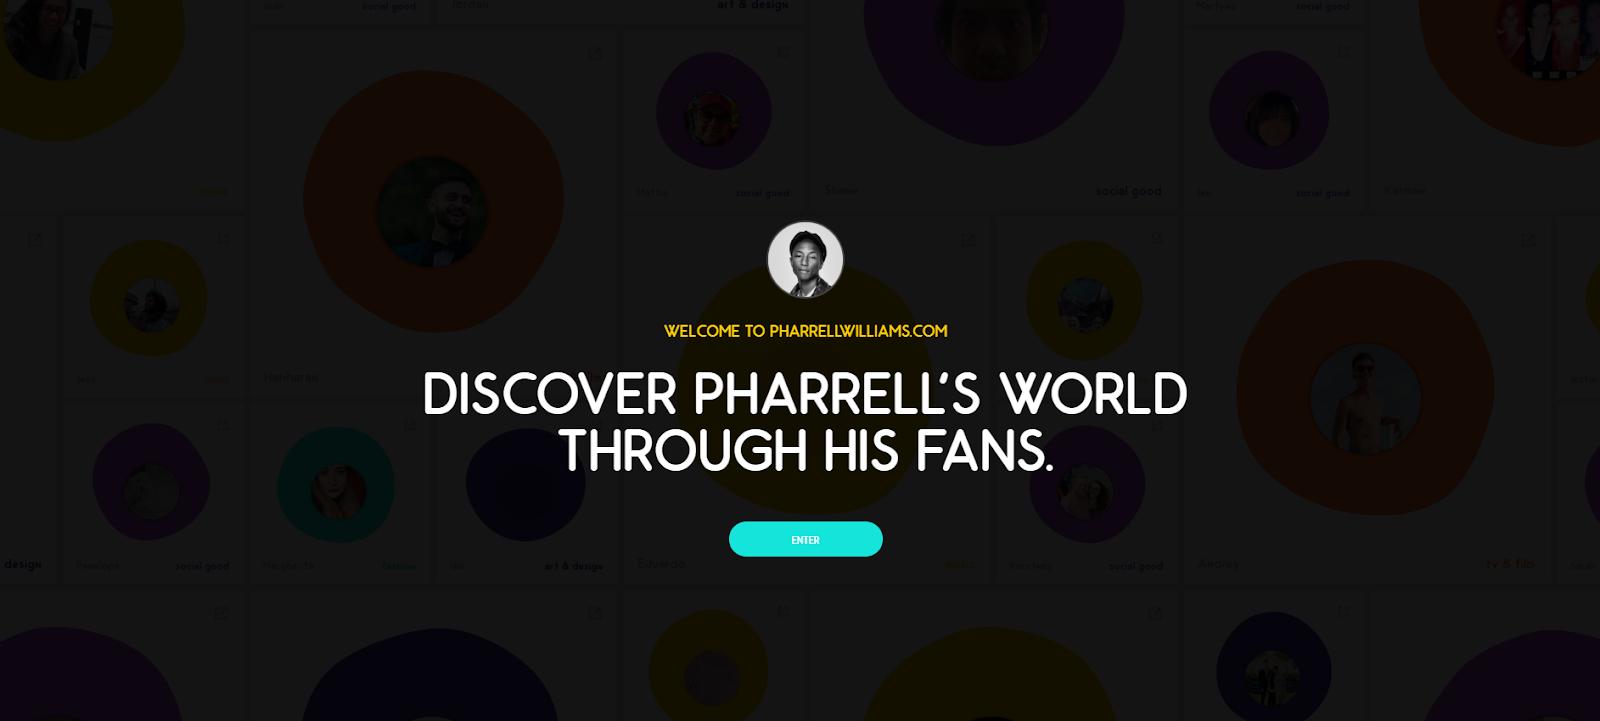 Pharrell Williams' personal website